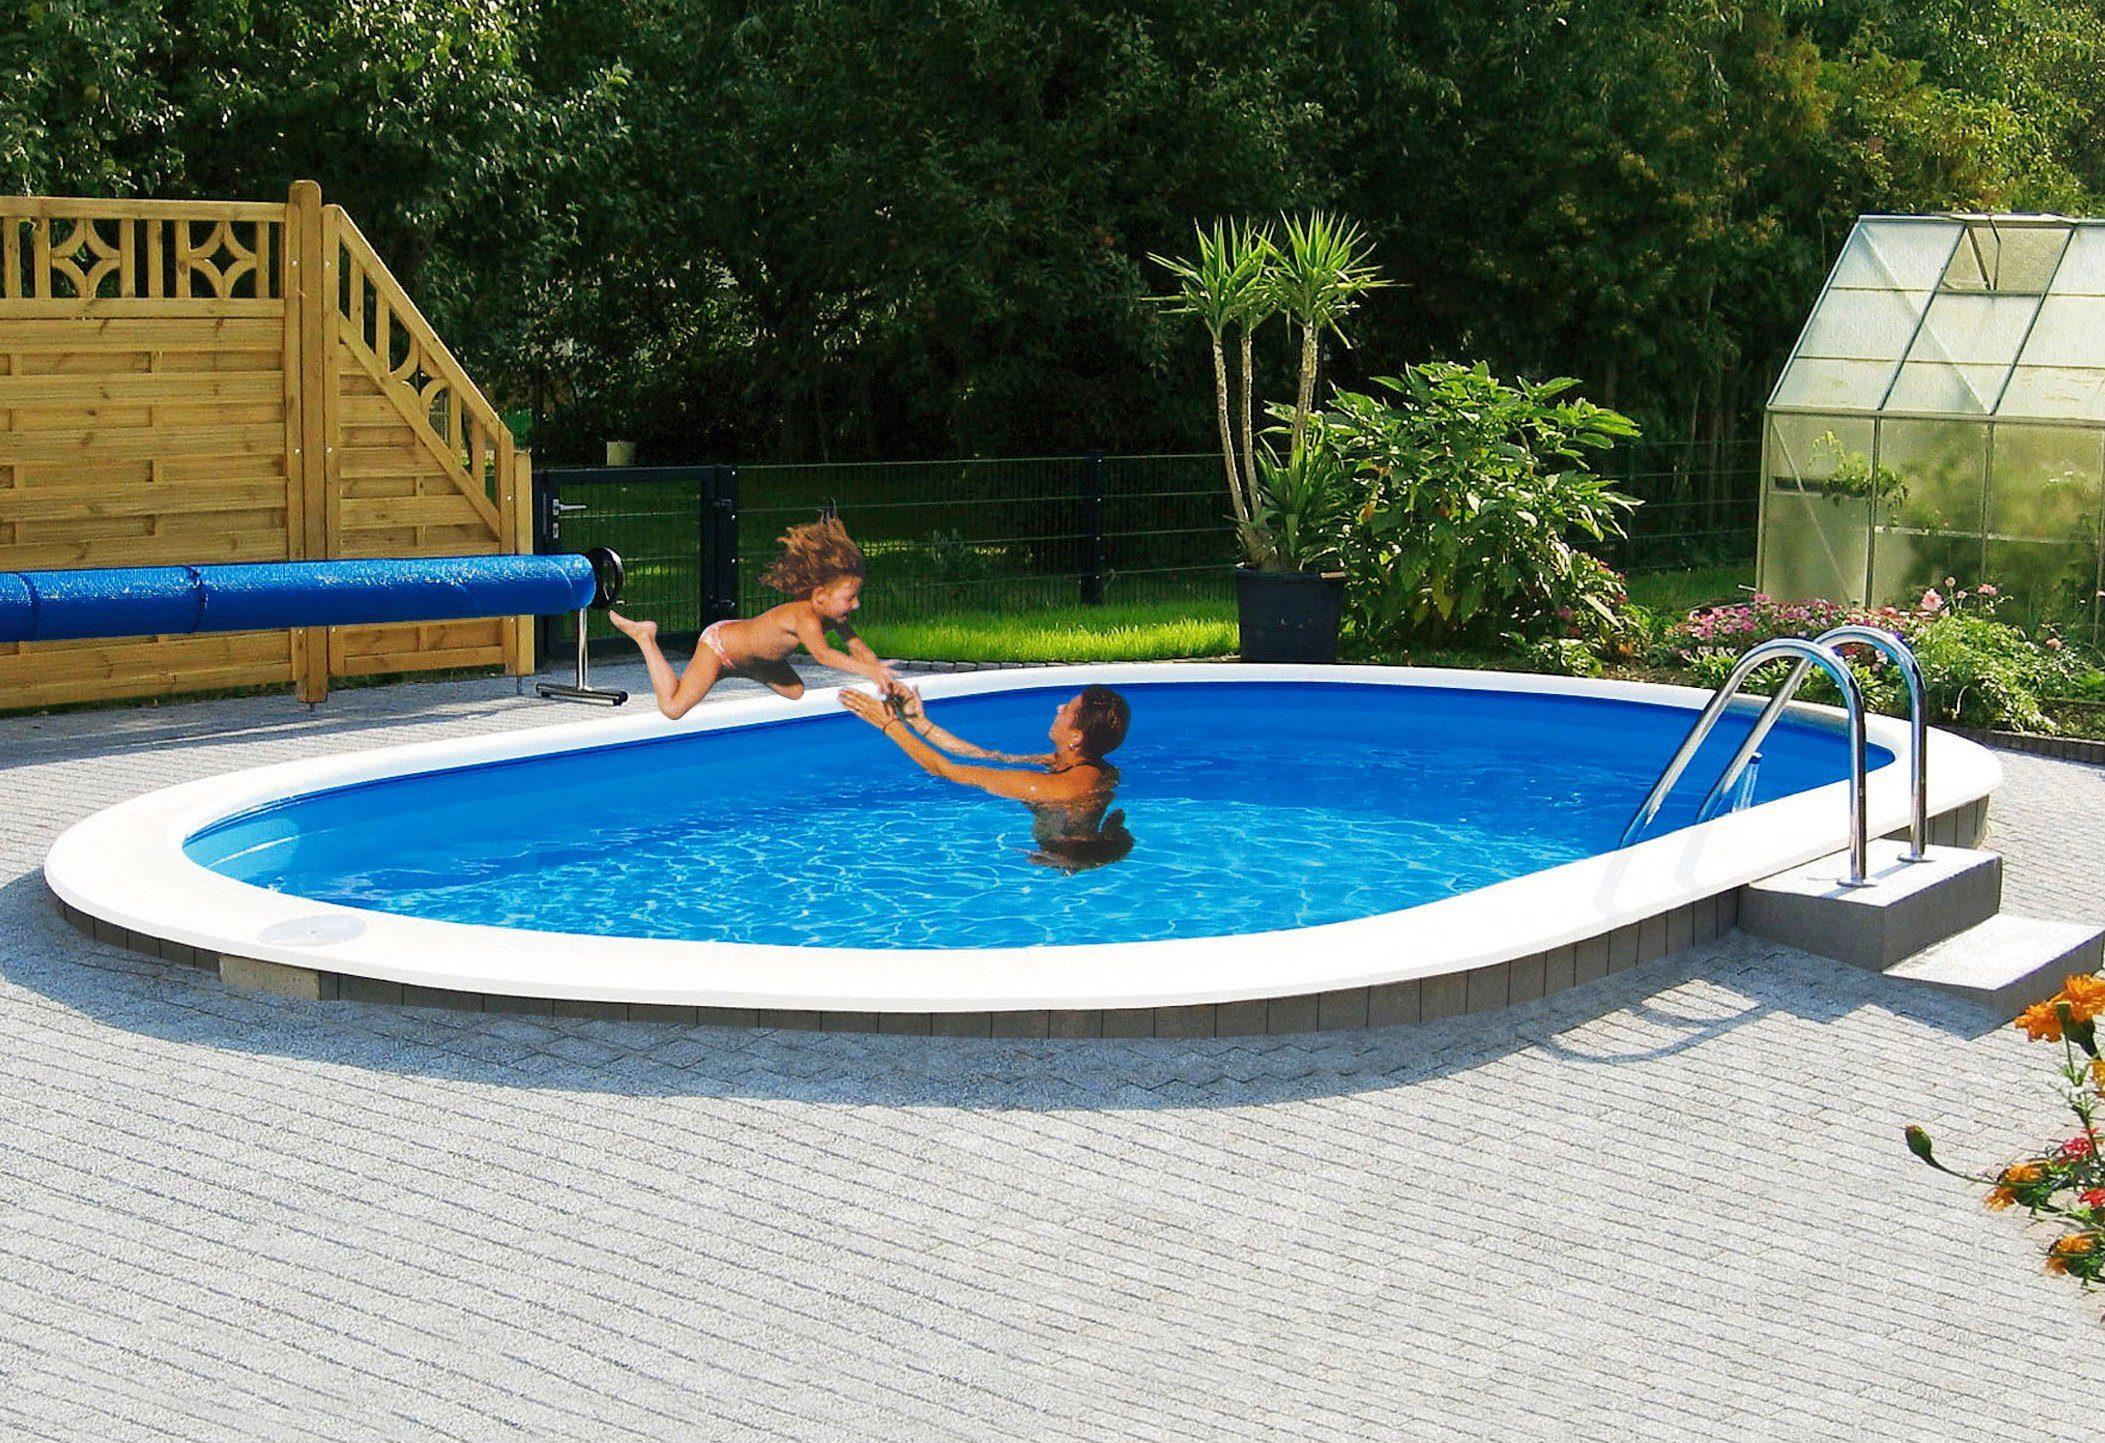 MYPOOL Ovalpool »Premium«, 737 x 360 x 120 cm, inkl. Bodenschutzvlies, Spezialhandlauf